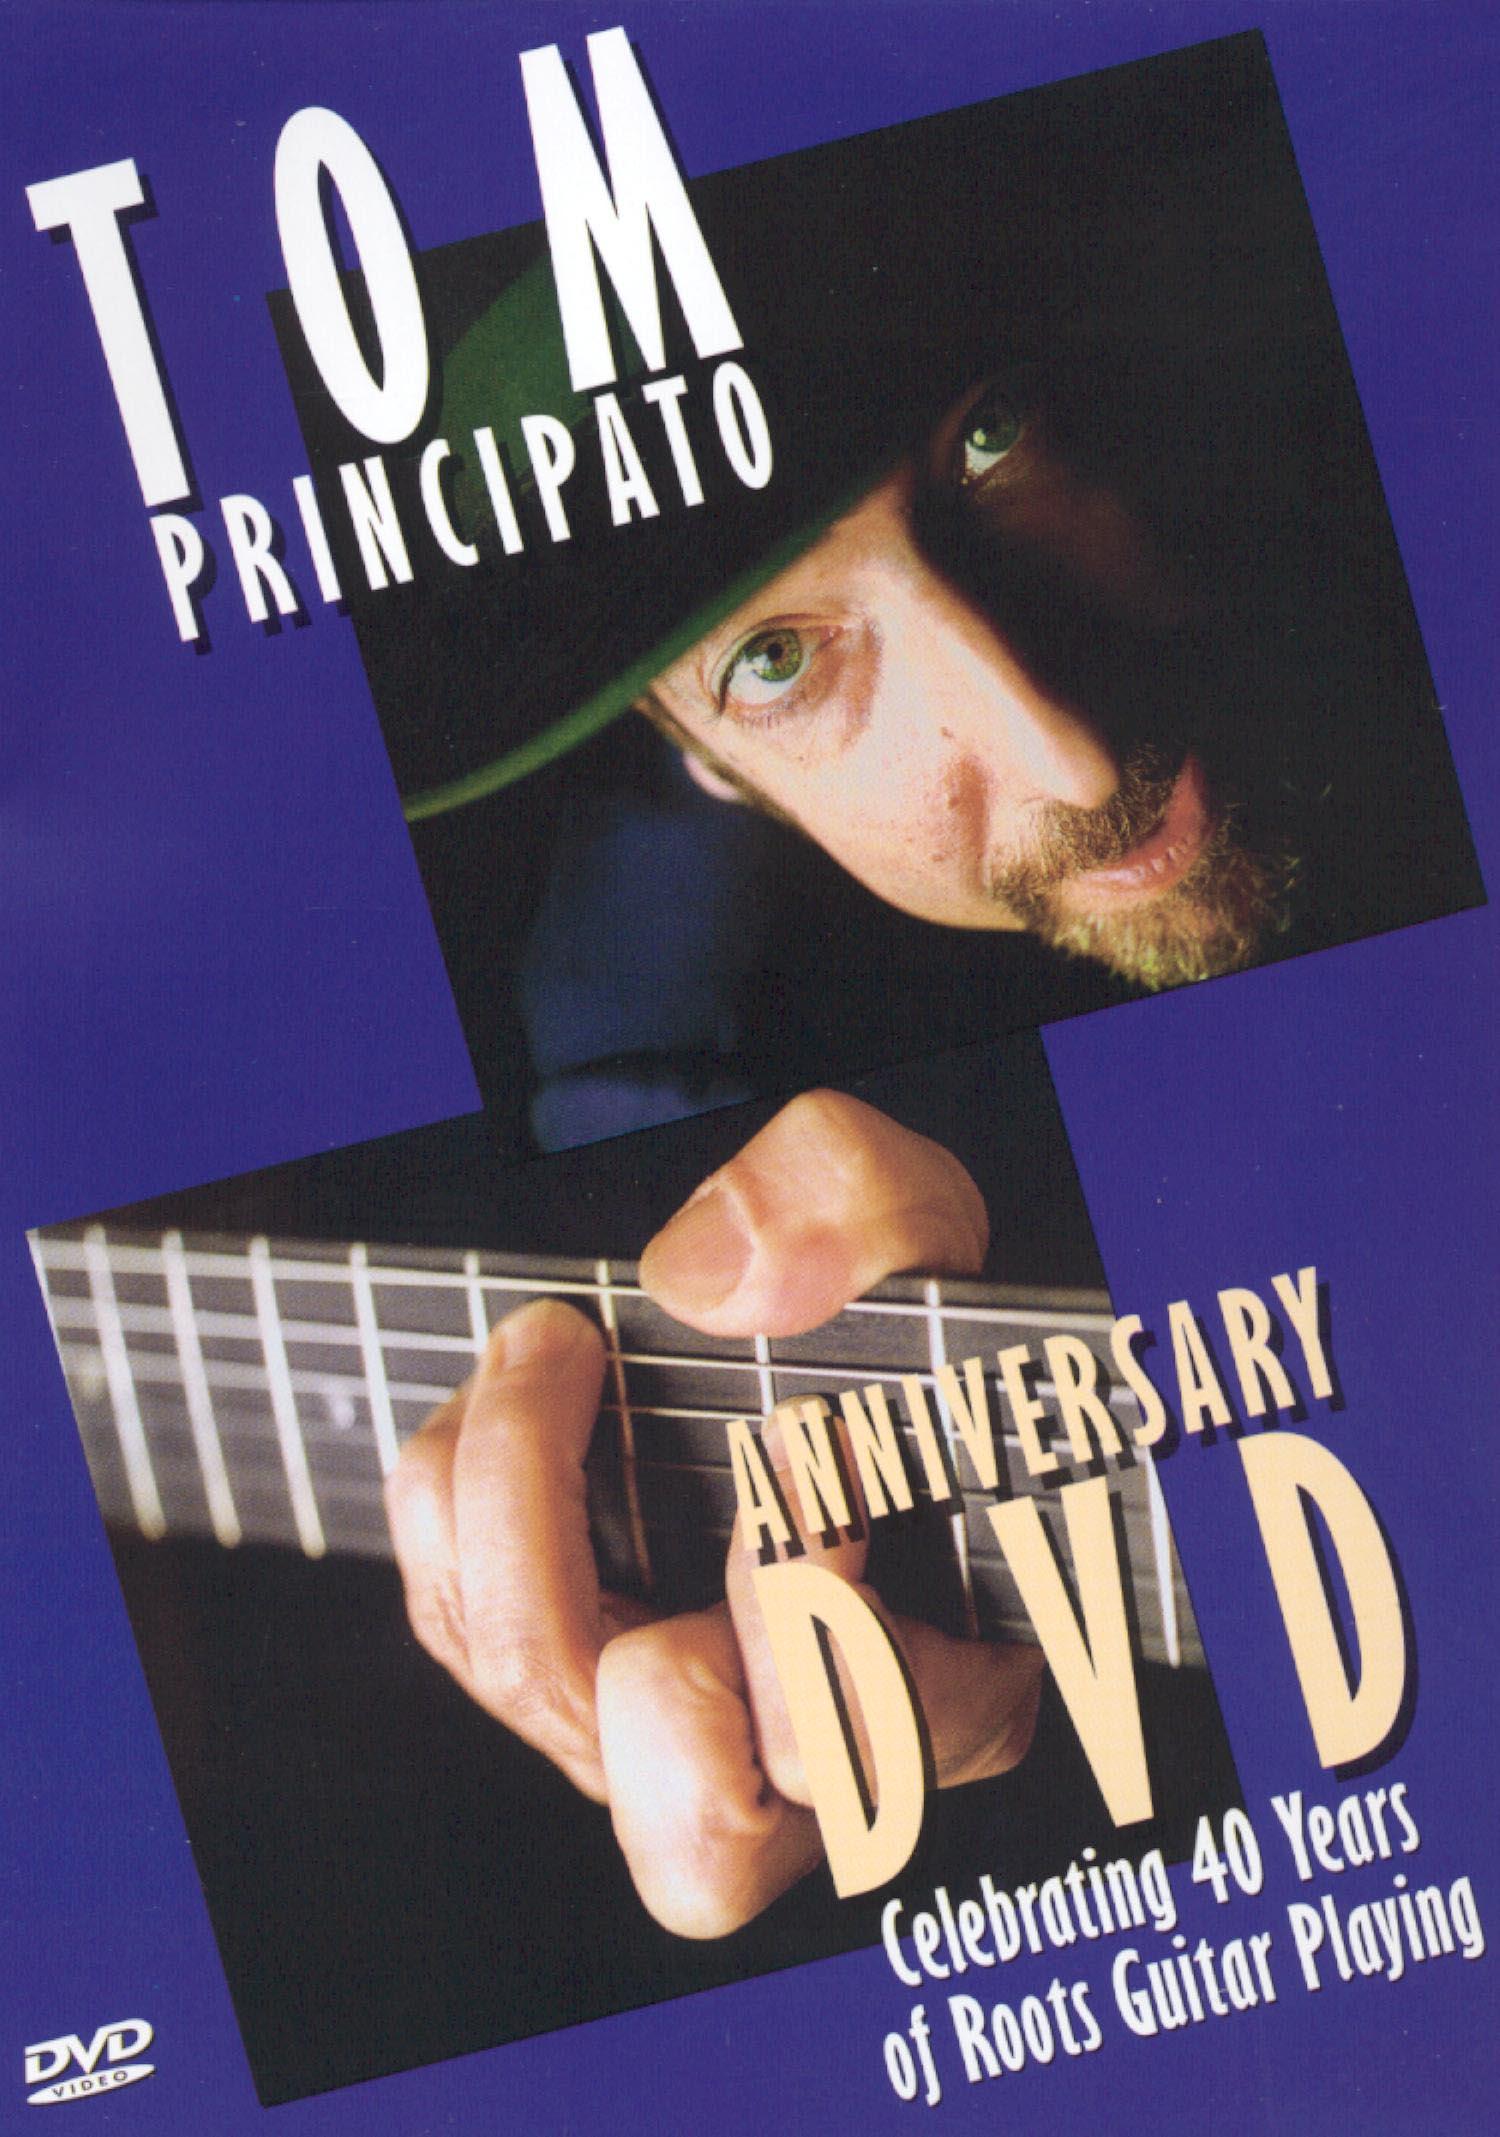 Tom Principato: Anniversary - Celebrating 40 Years